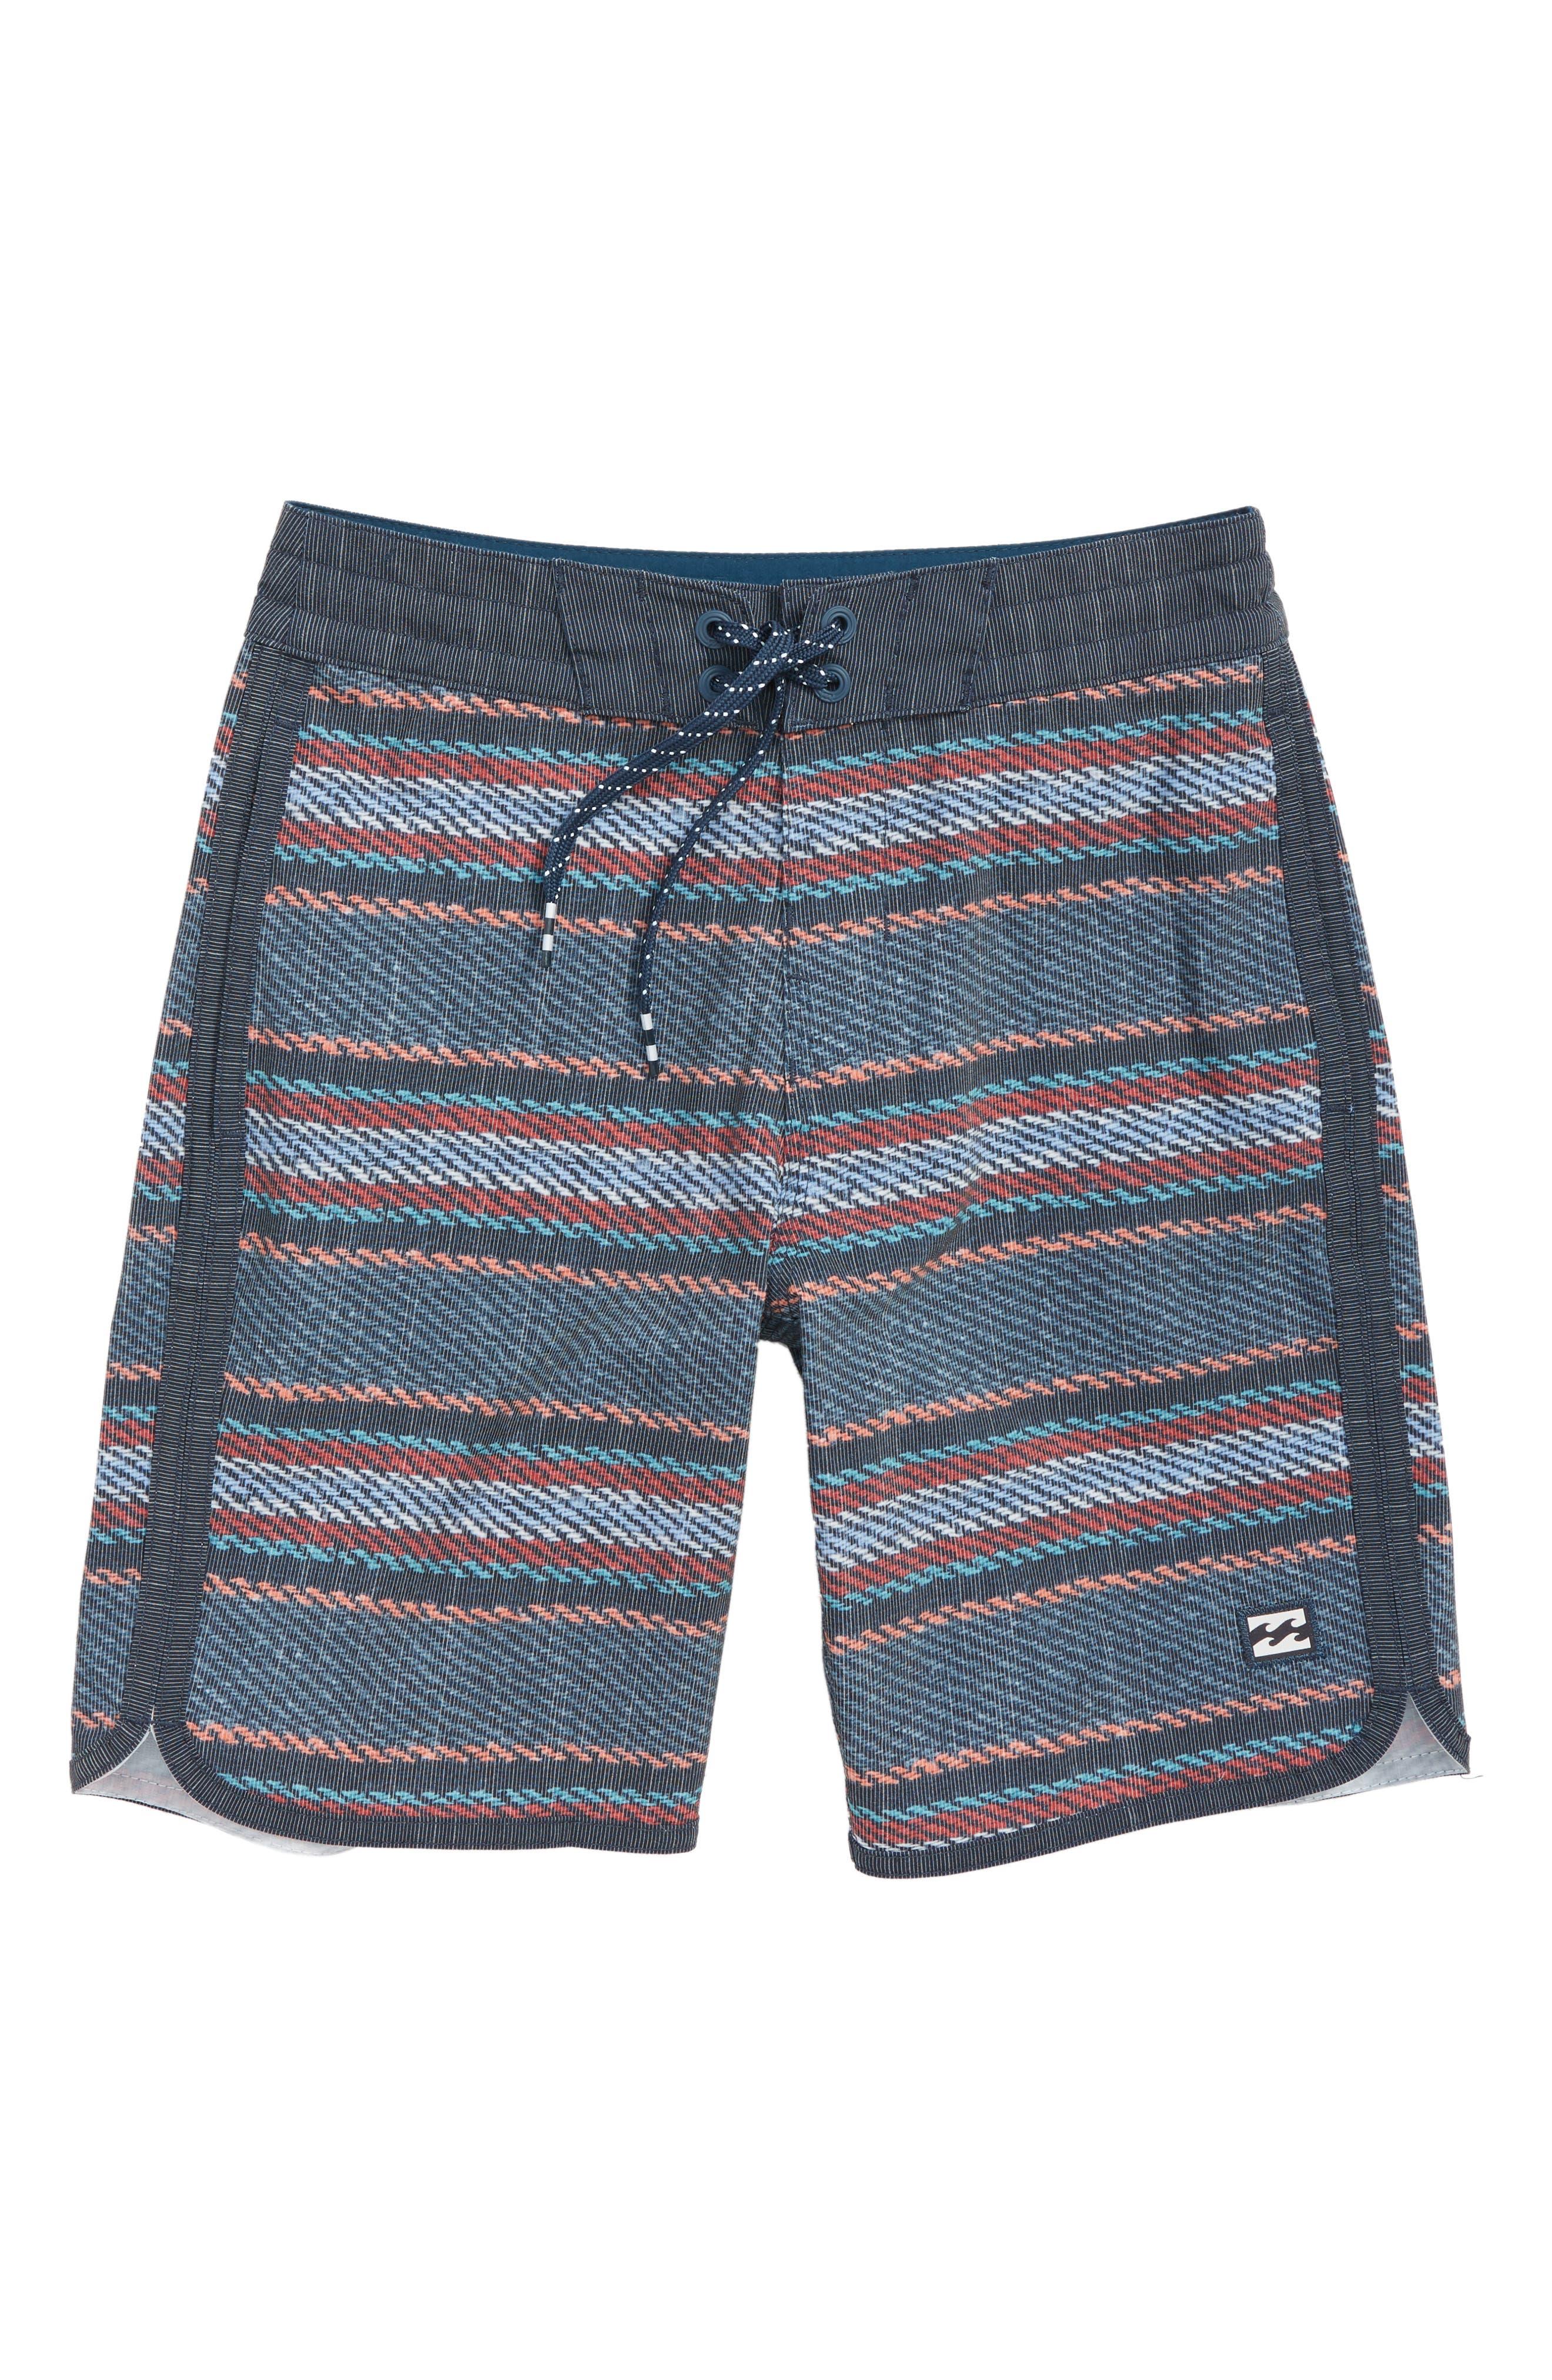 73 LT Lineup Board Shorts,                             Main thumbnail 1, color,                             INDIGO STRIPE